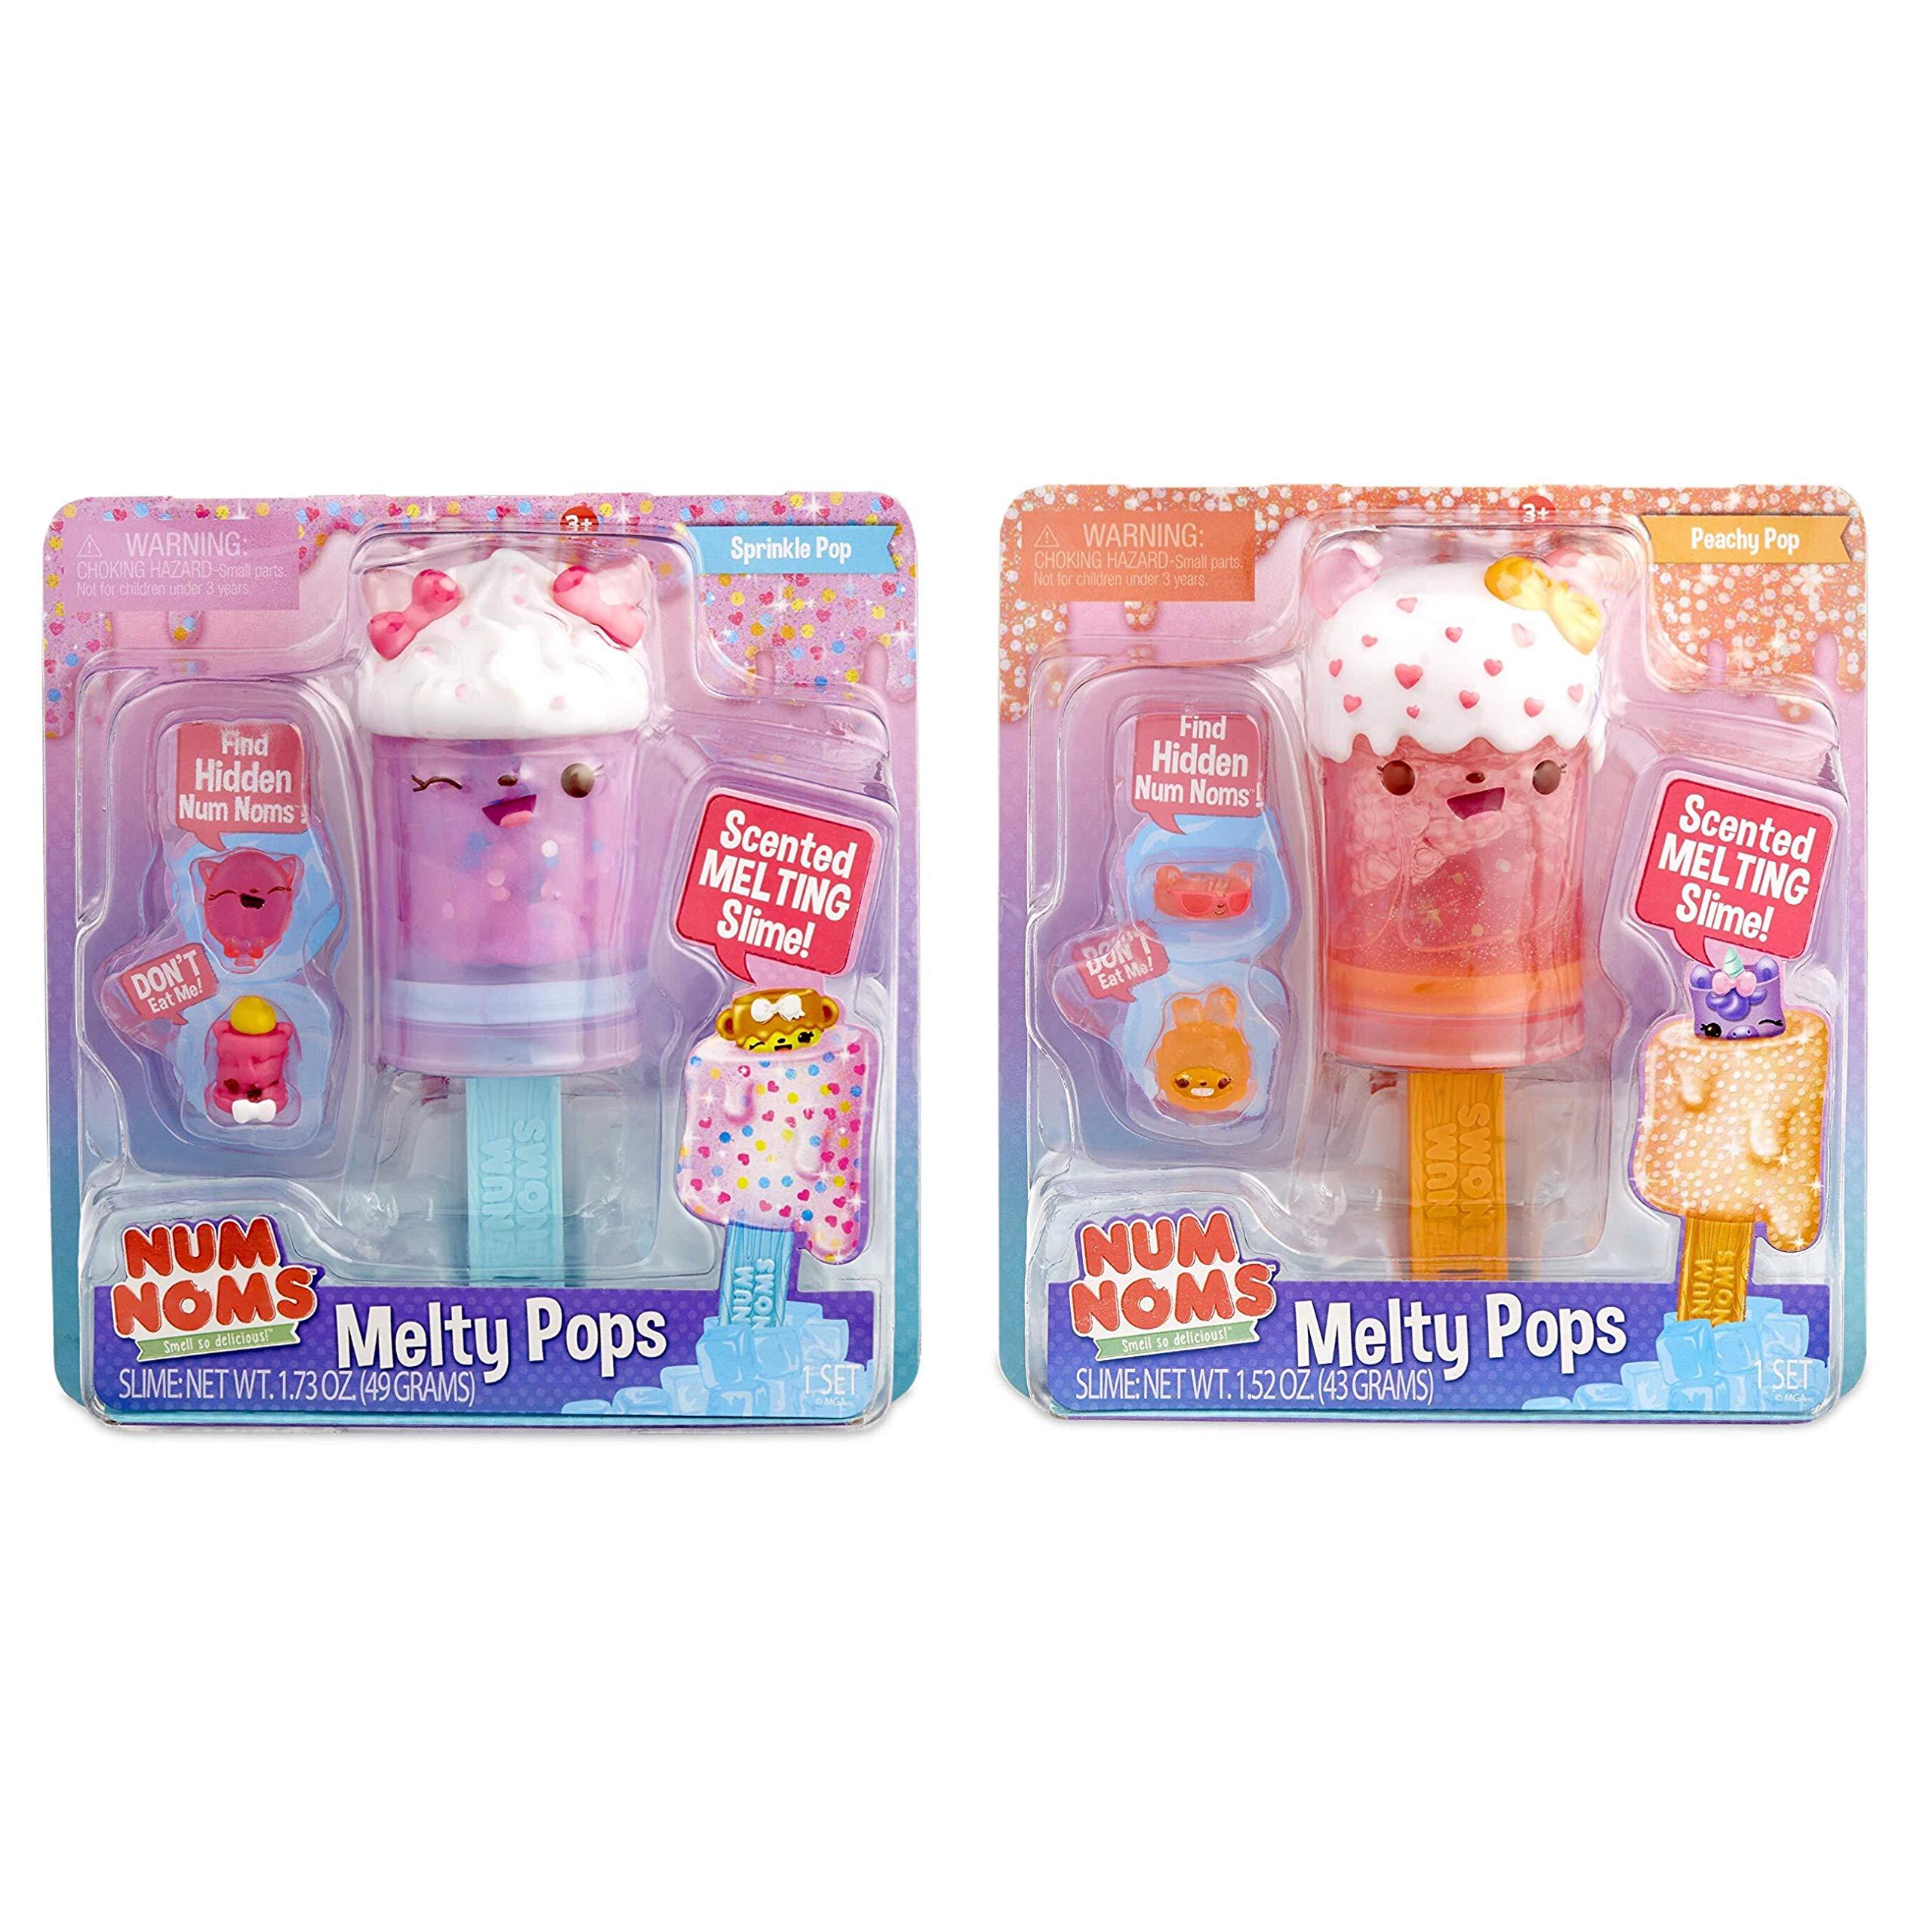 Num Noms Snackables Melty Pops- Peachy Pop and Sprinkler Pop Bundle by Num Noms (Image #1)